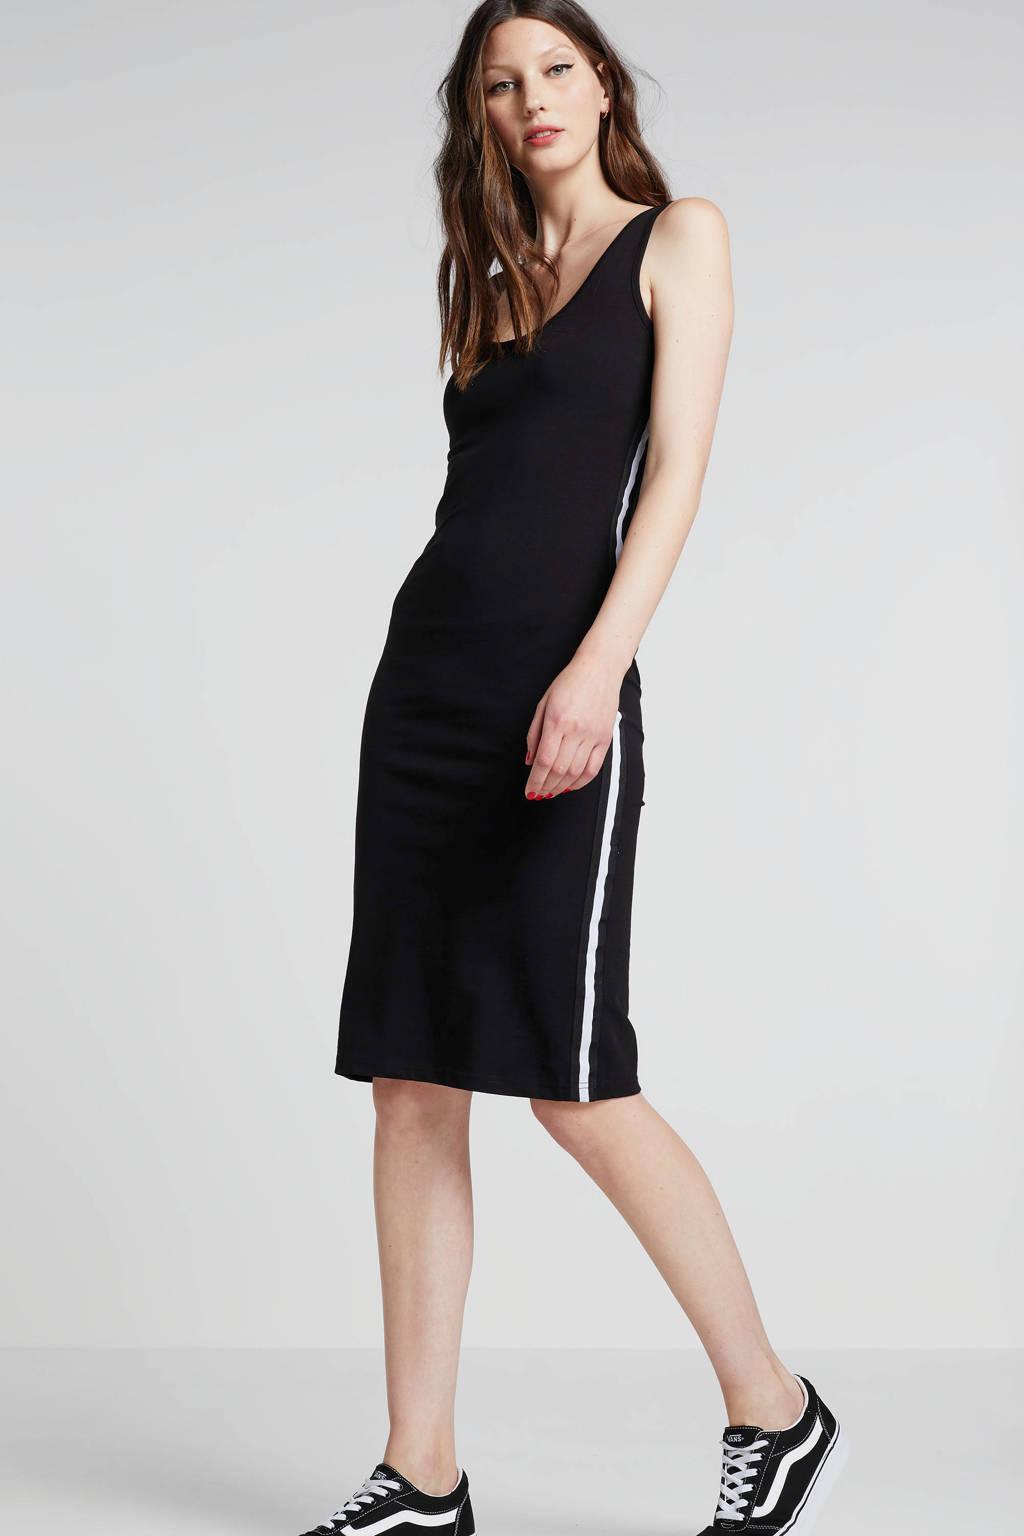 whkmp's beachwave jurk met contrasterende bies zwart, Zwart/wit